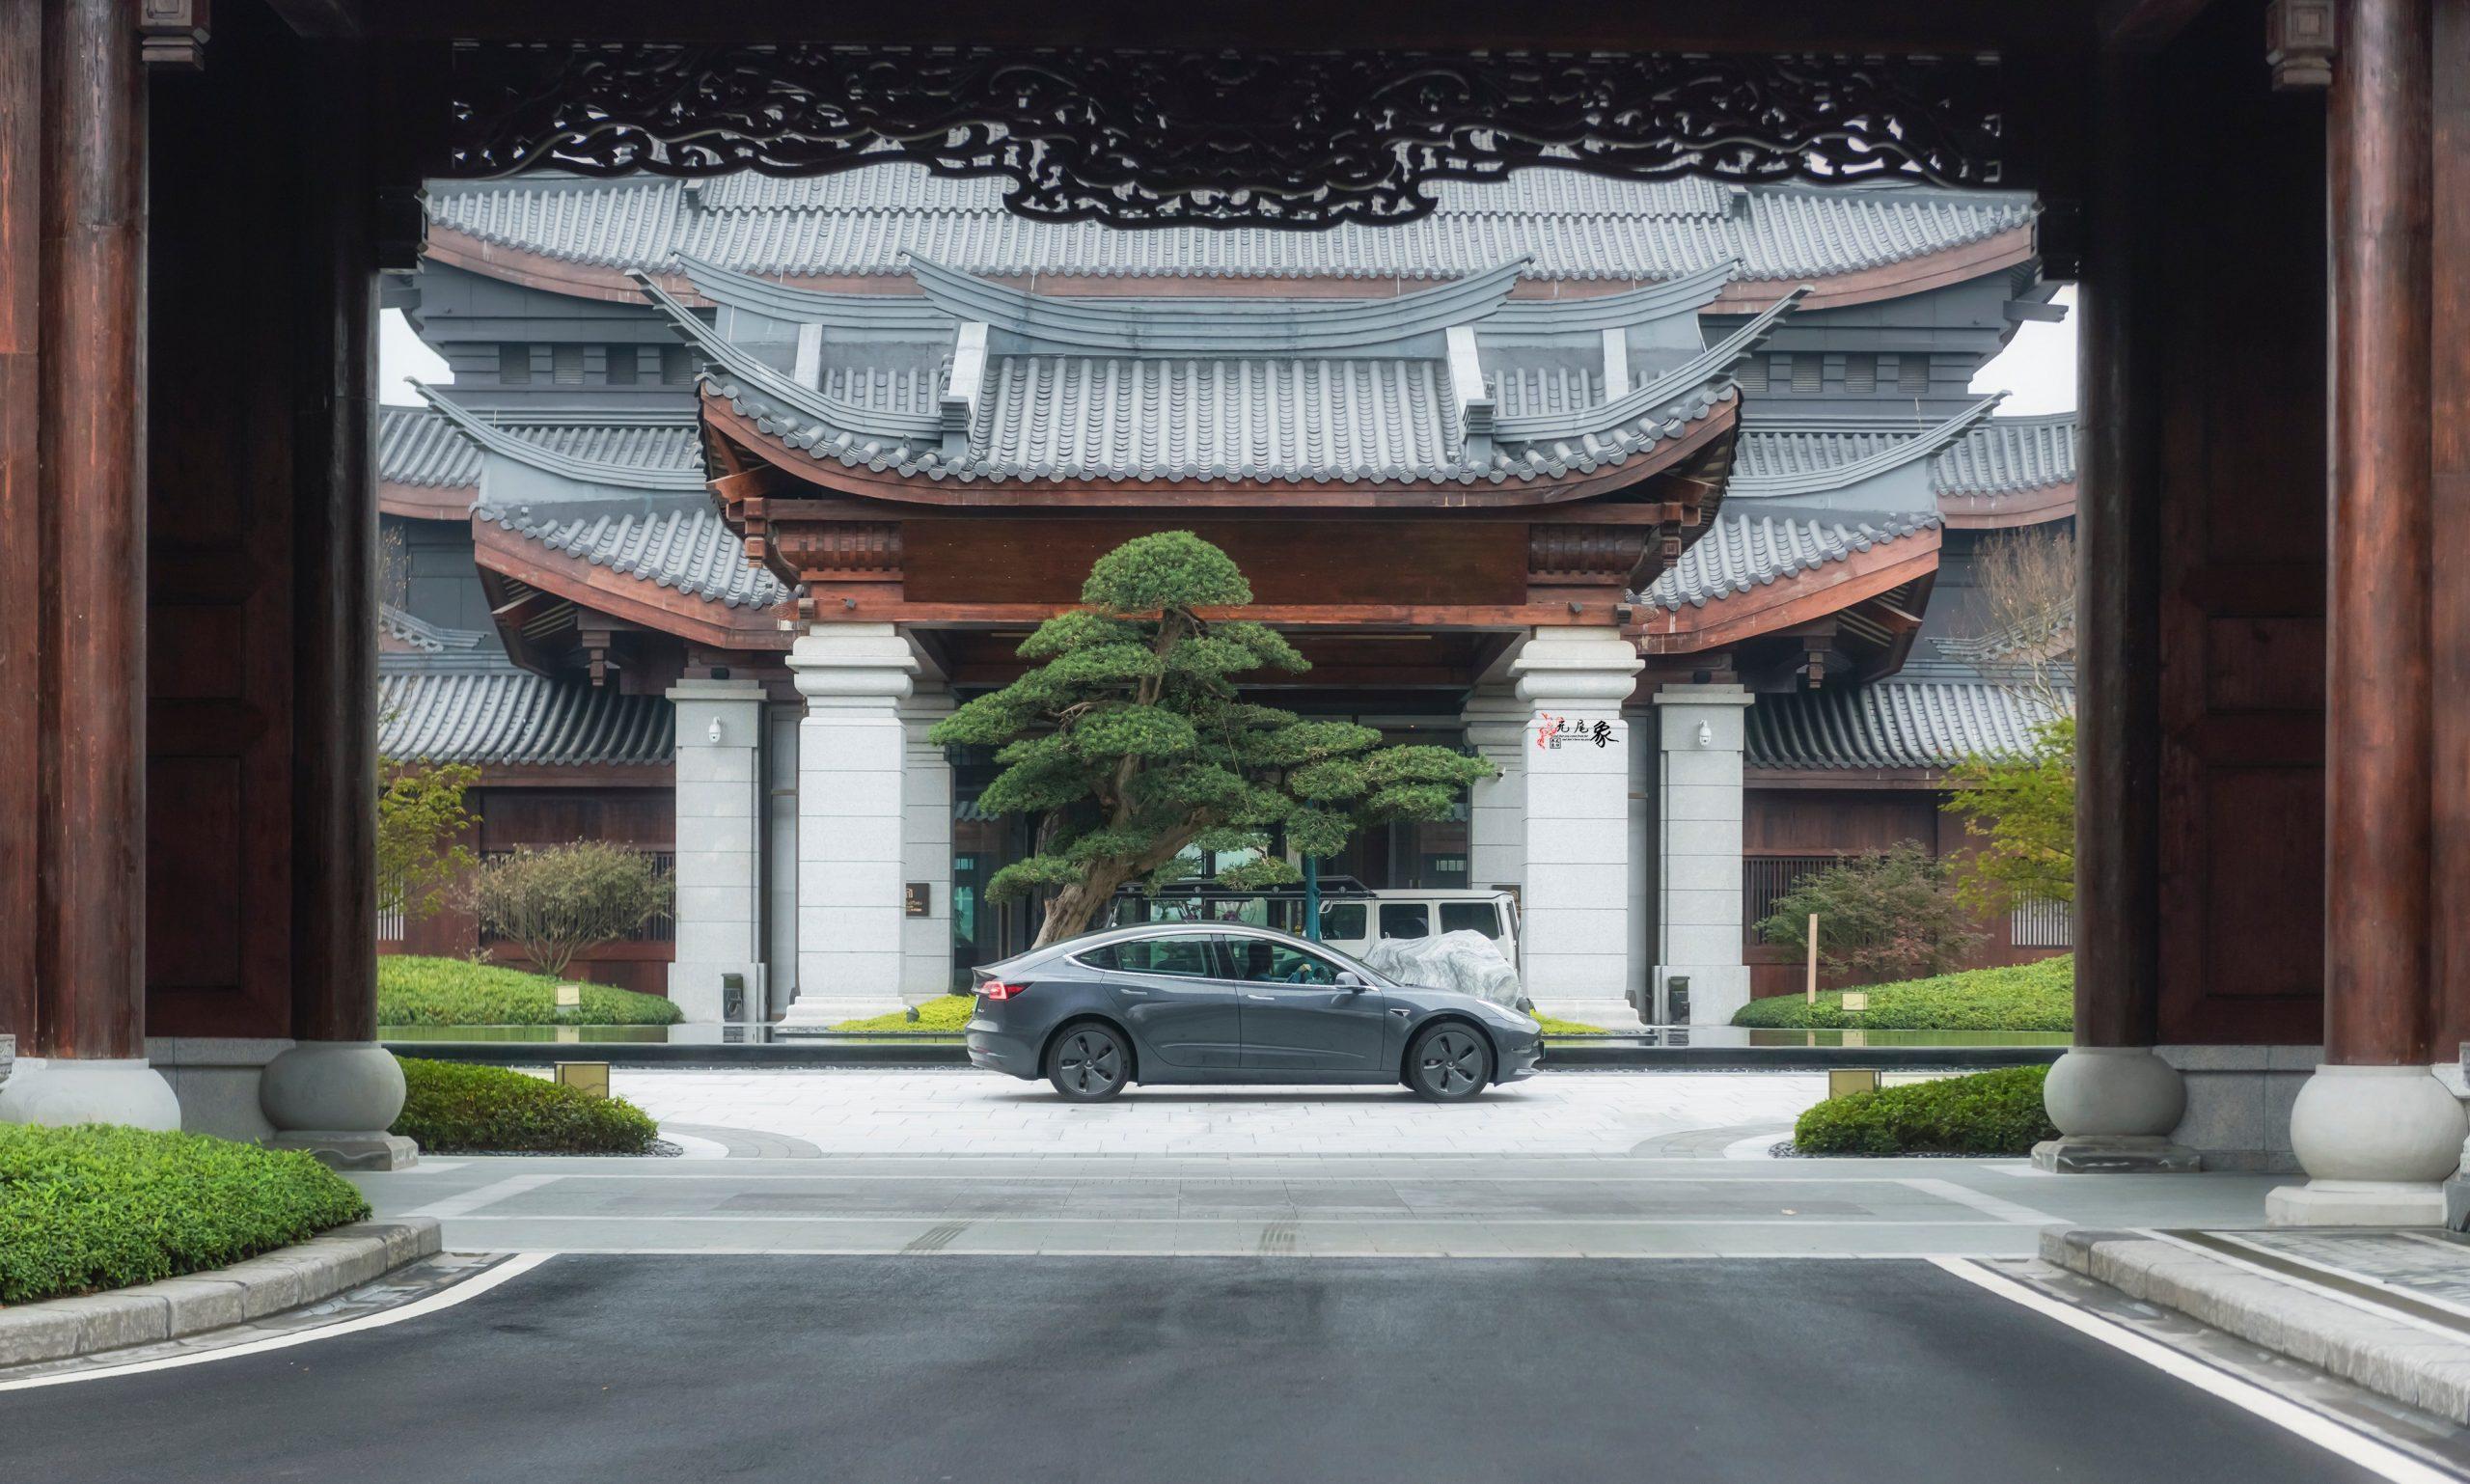 telsa-china-supercharger-v3-sales-service-center-gigafactory-shanghai